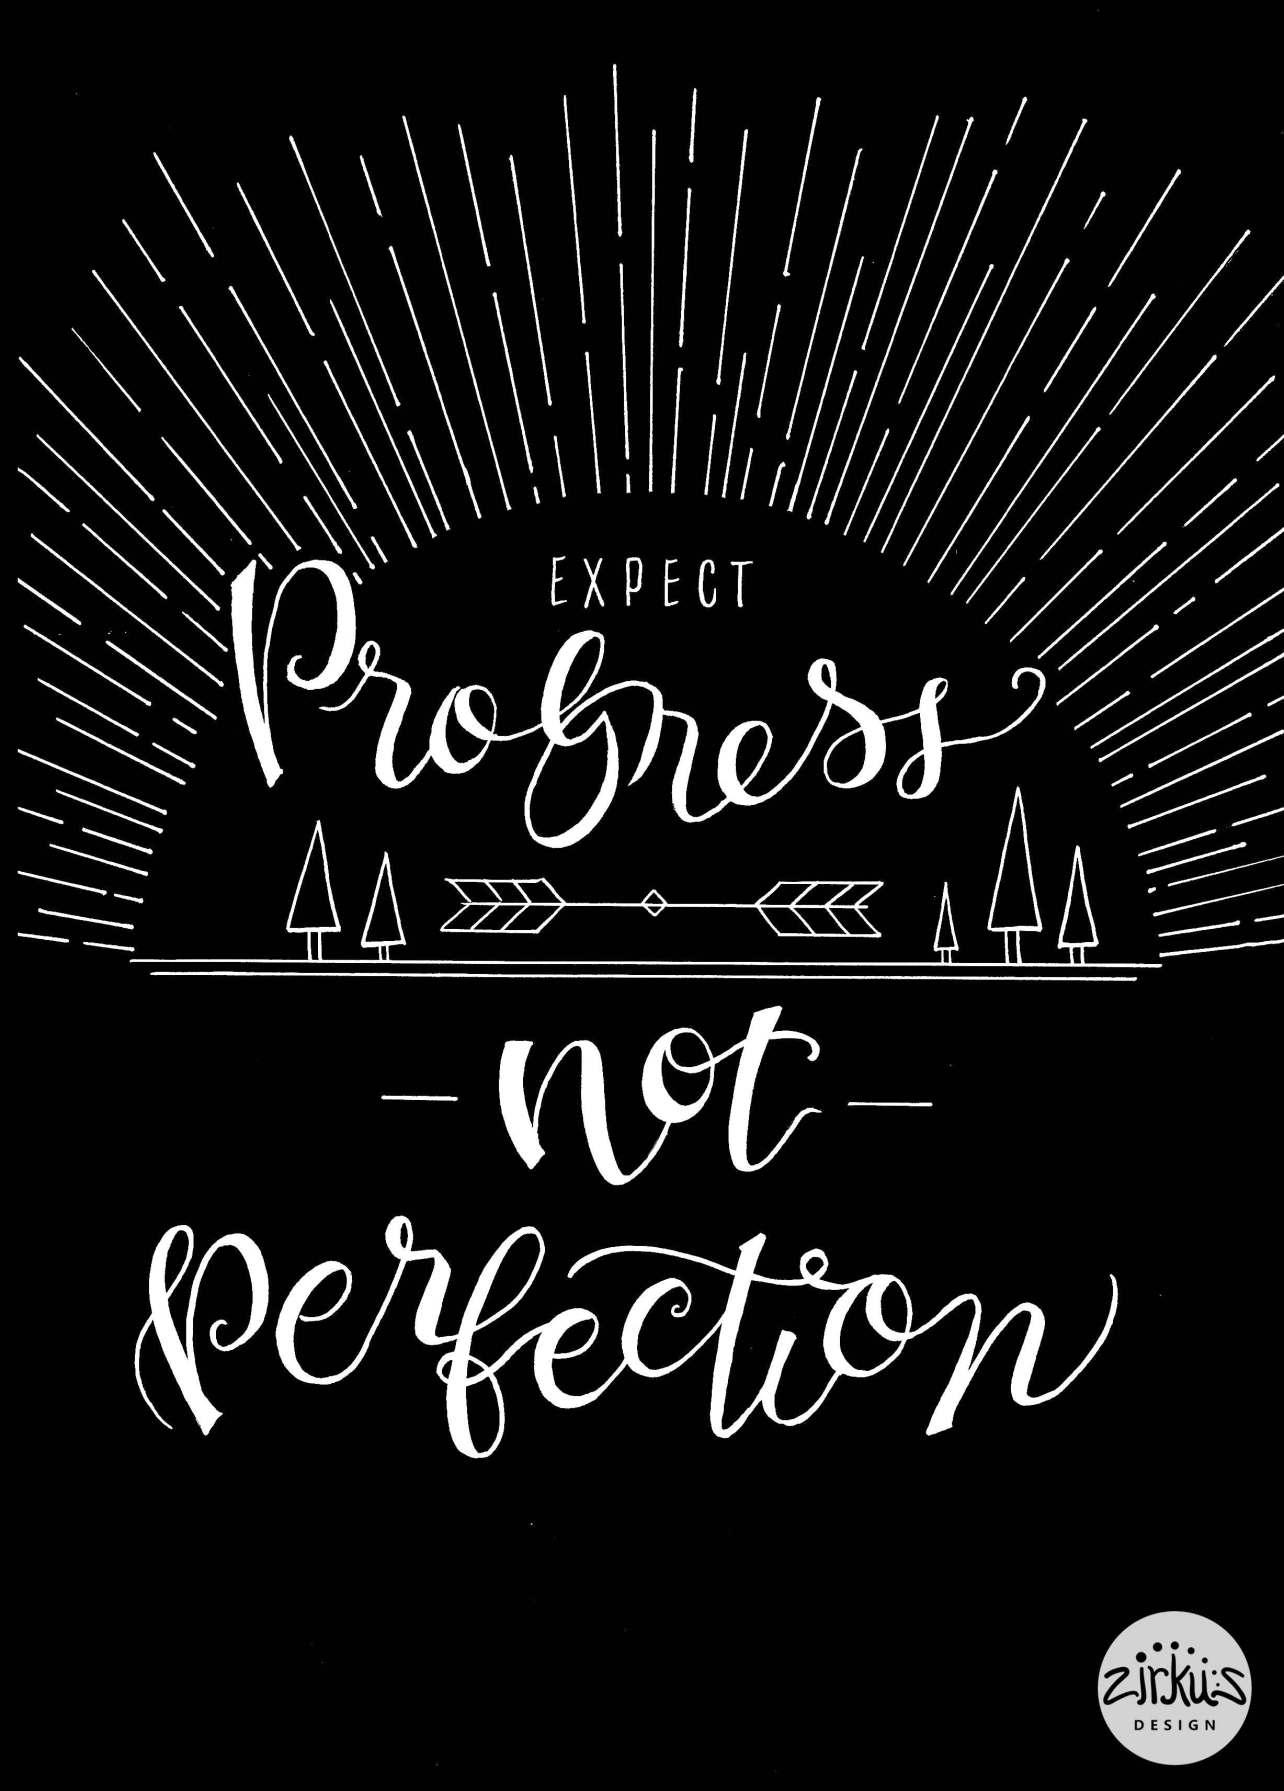 Zirkus Design | Expect Progress Not Perfection Inverse | Hand Lettering + Pen & Ink